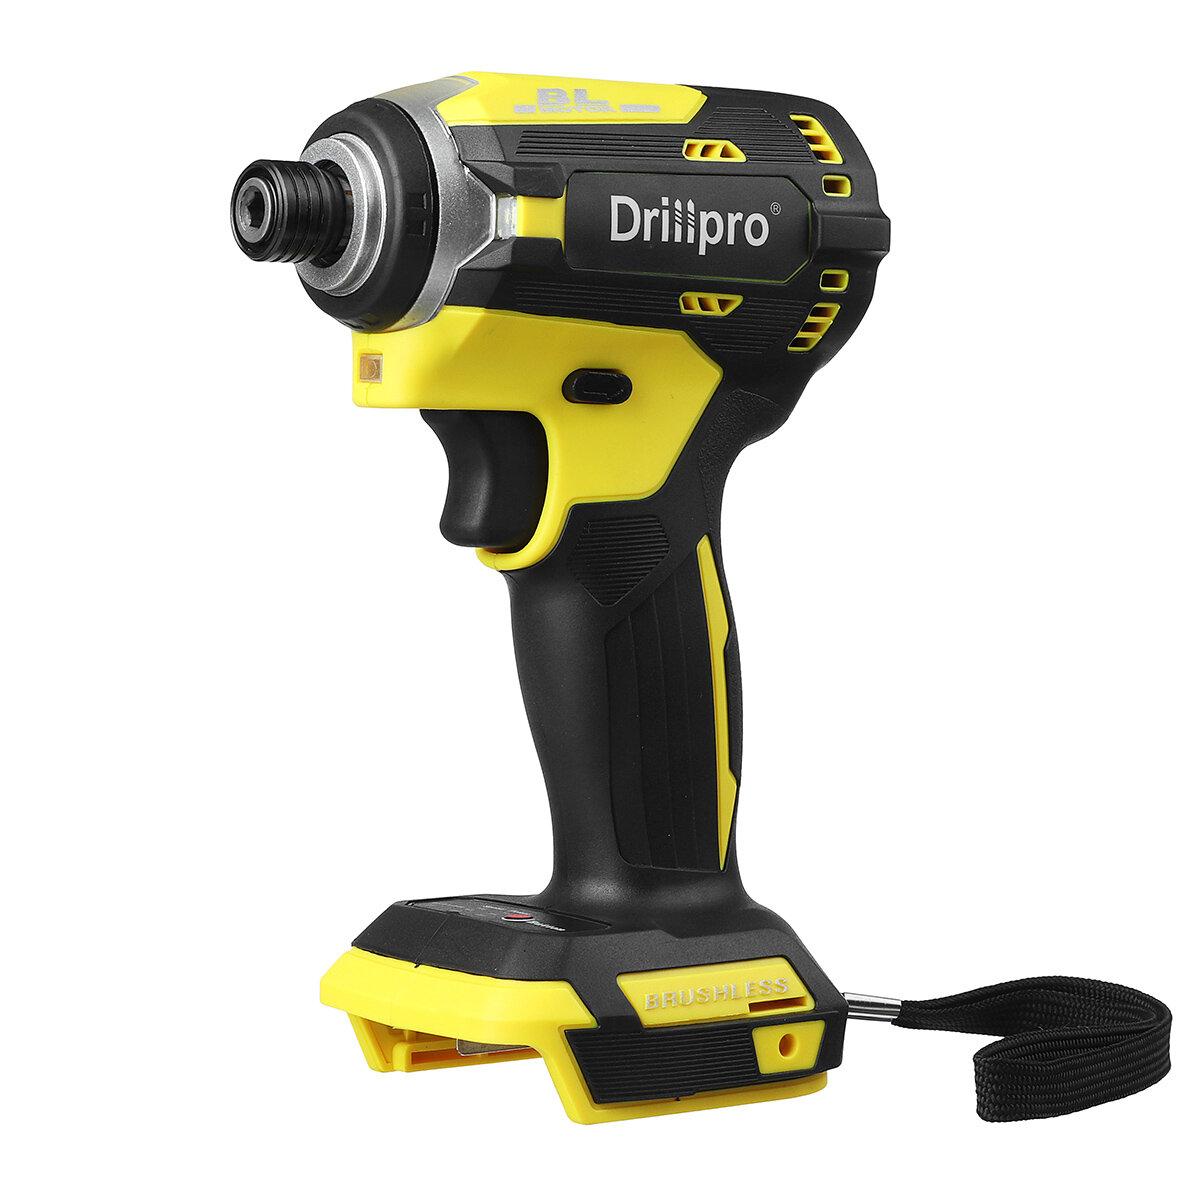 Drillpro 3 Light Electric Screwdriver150